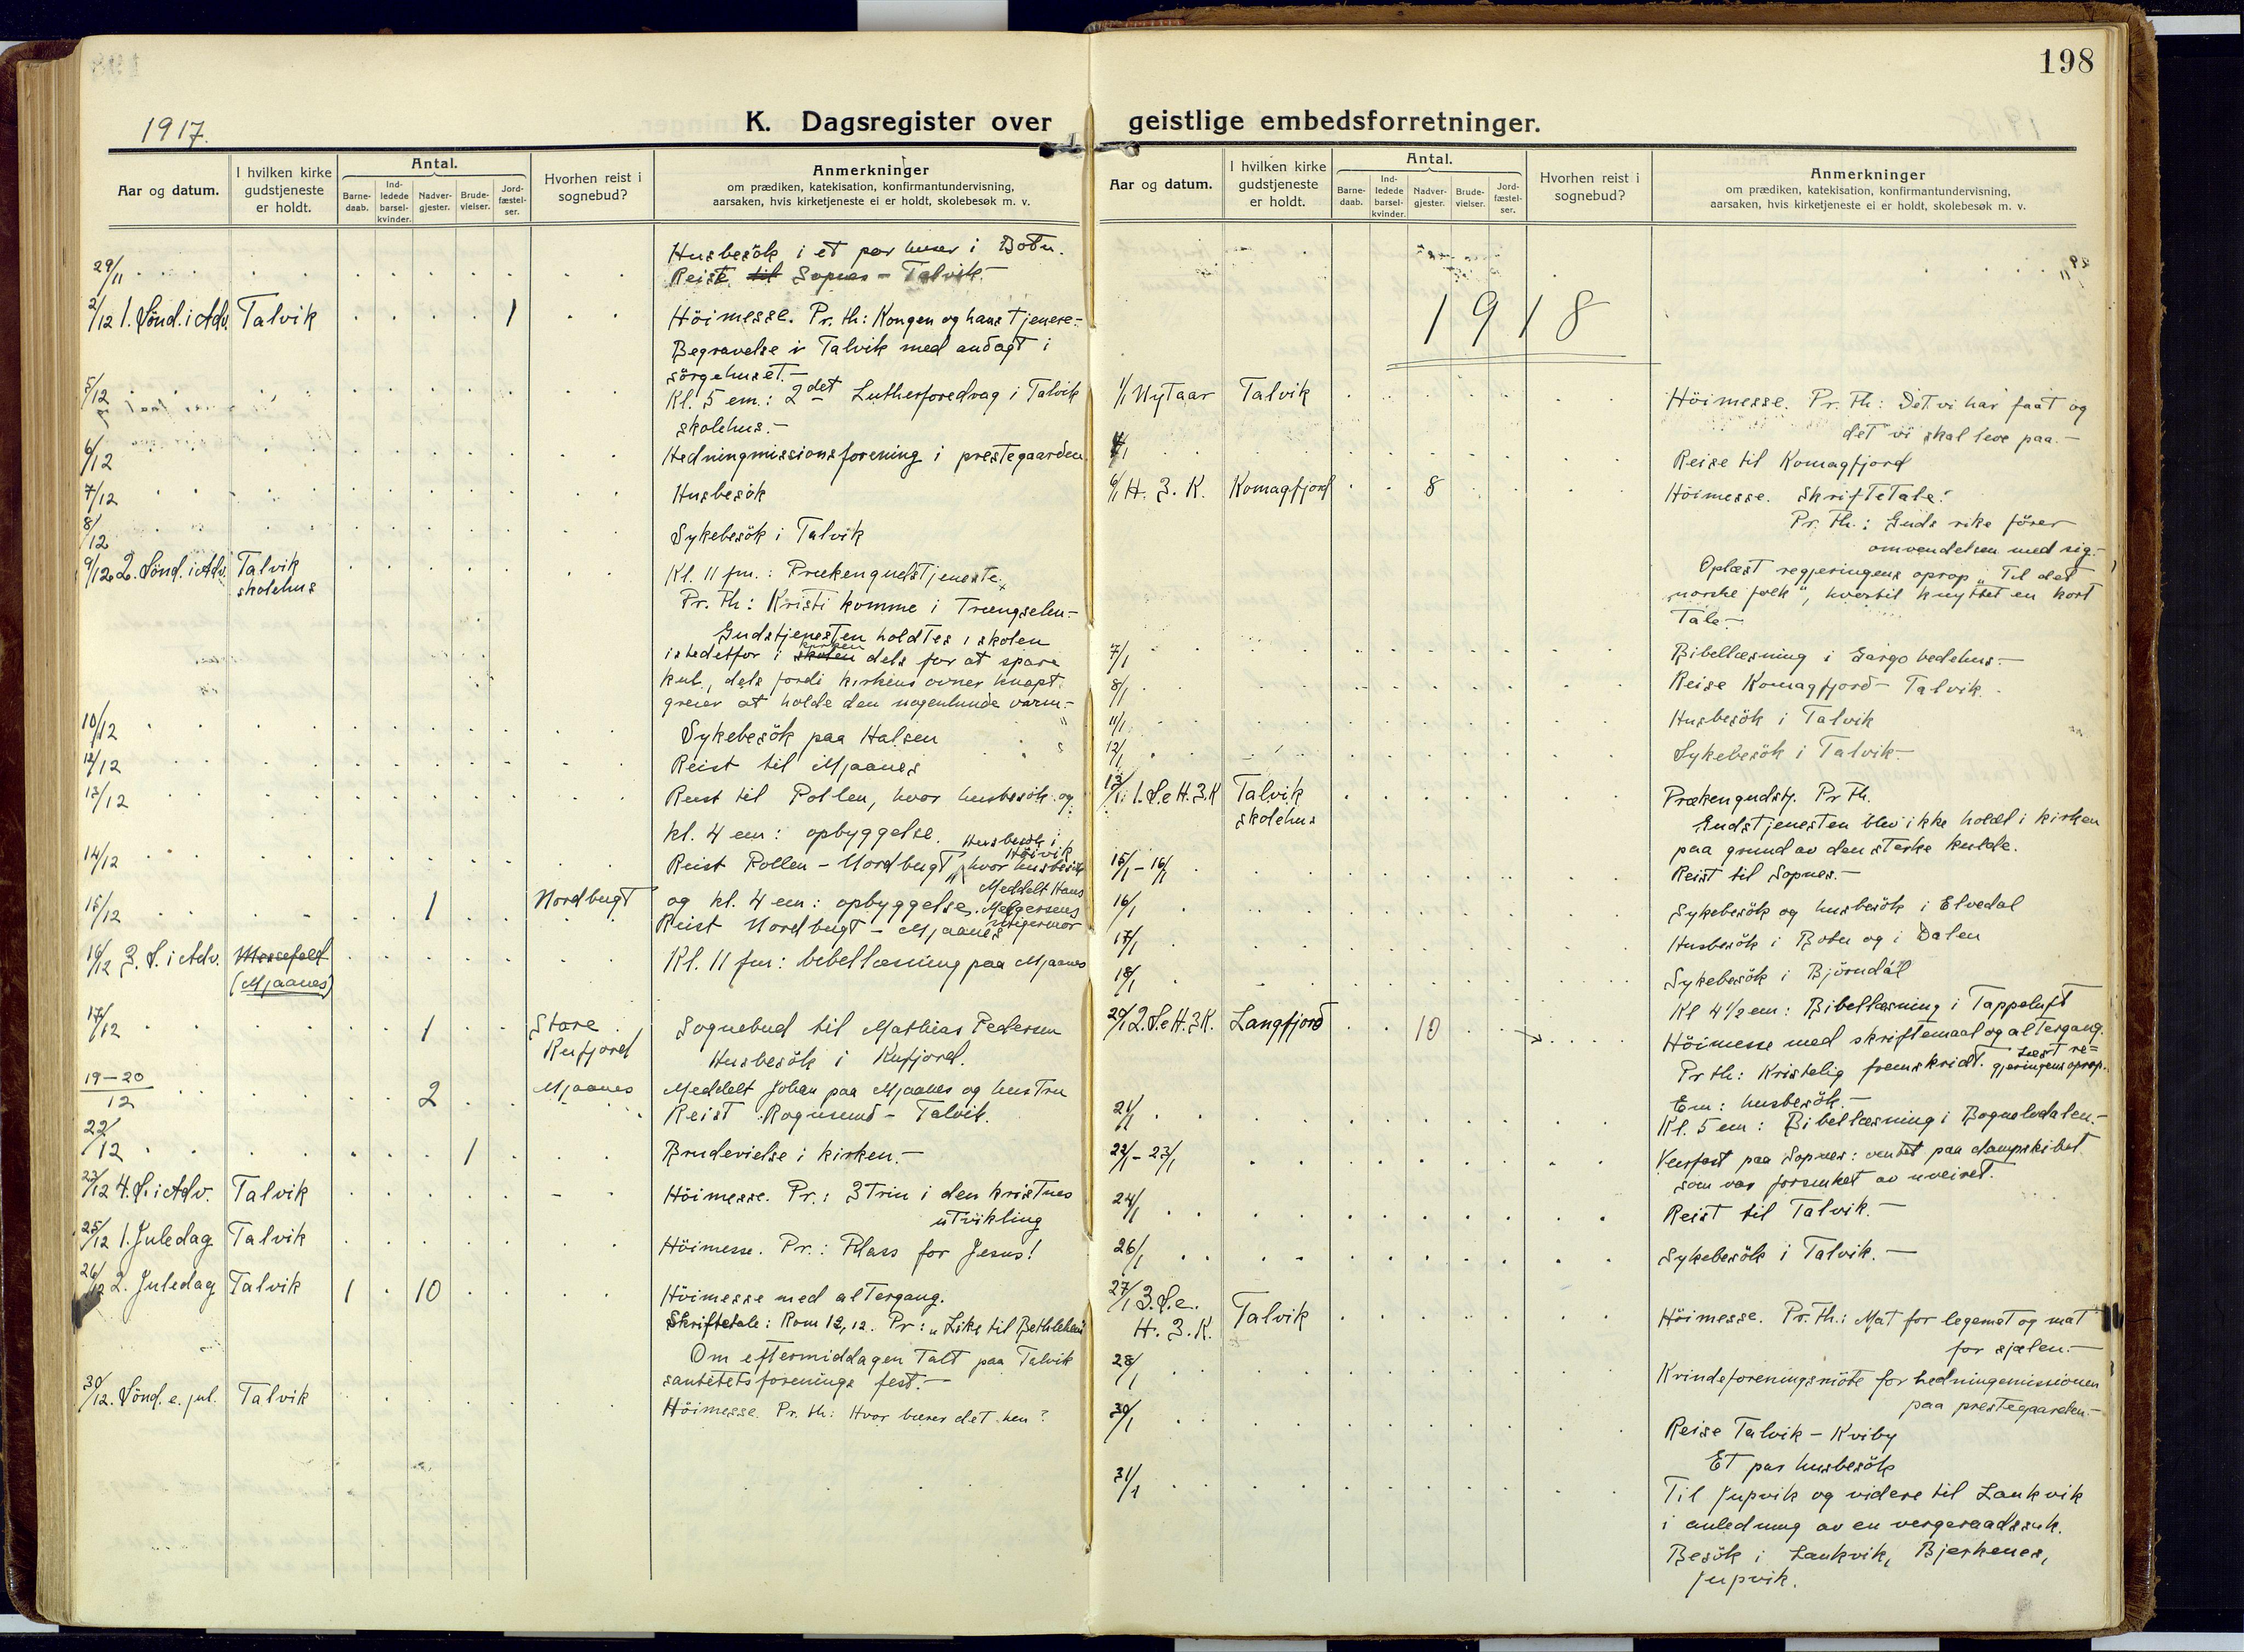 SATØ, Talvik sokneprestkontor, H/Ha/L0018kirke: Ministerialbok nr. 18, 1915-1924, s. 198